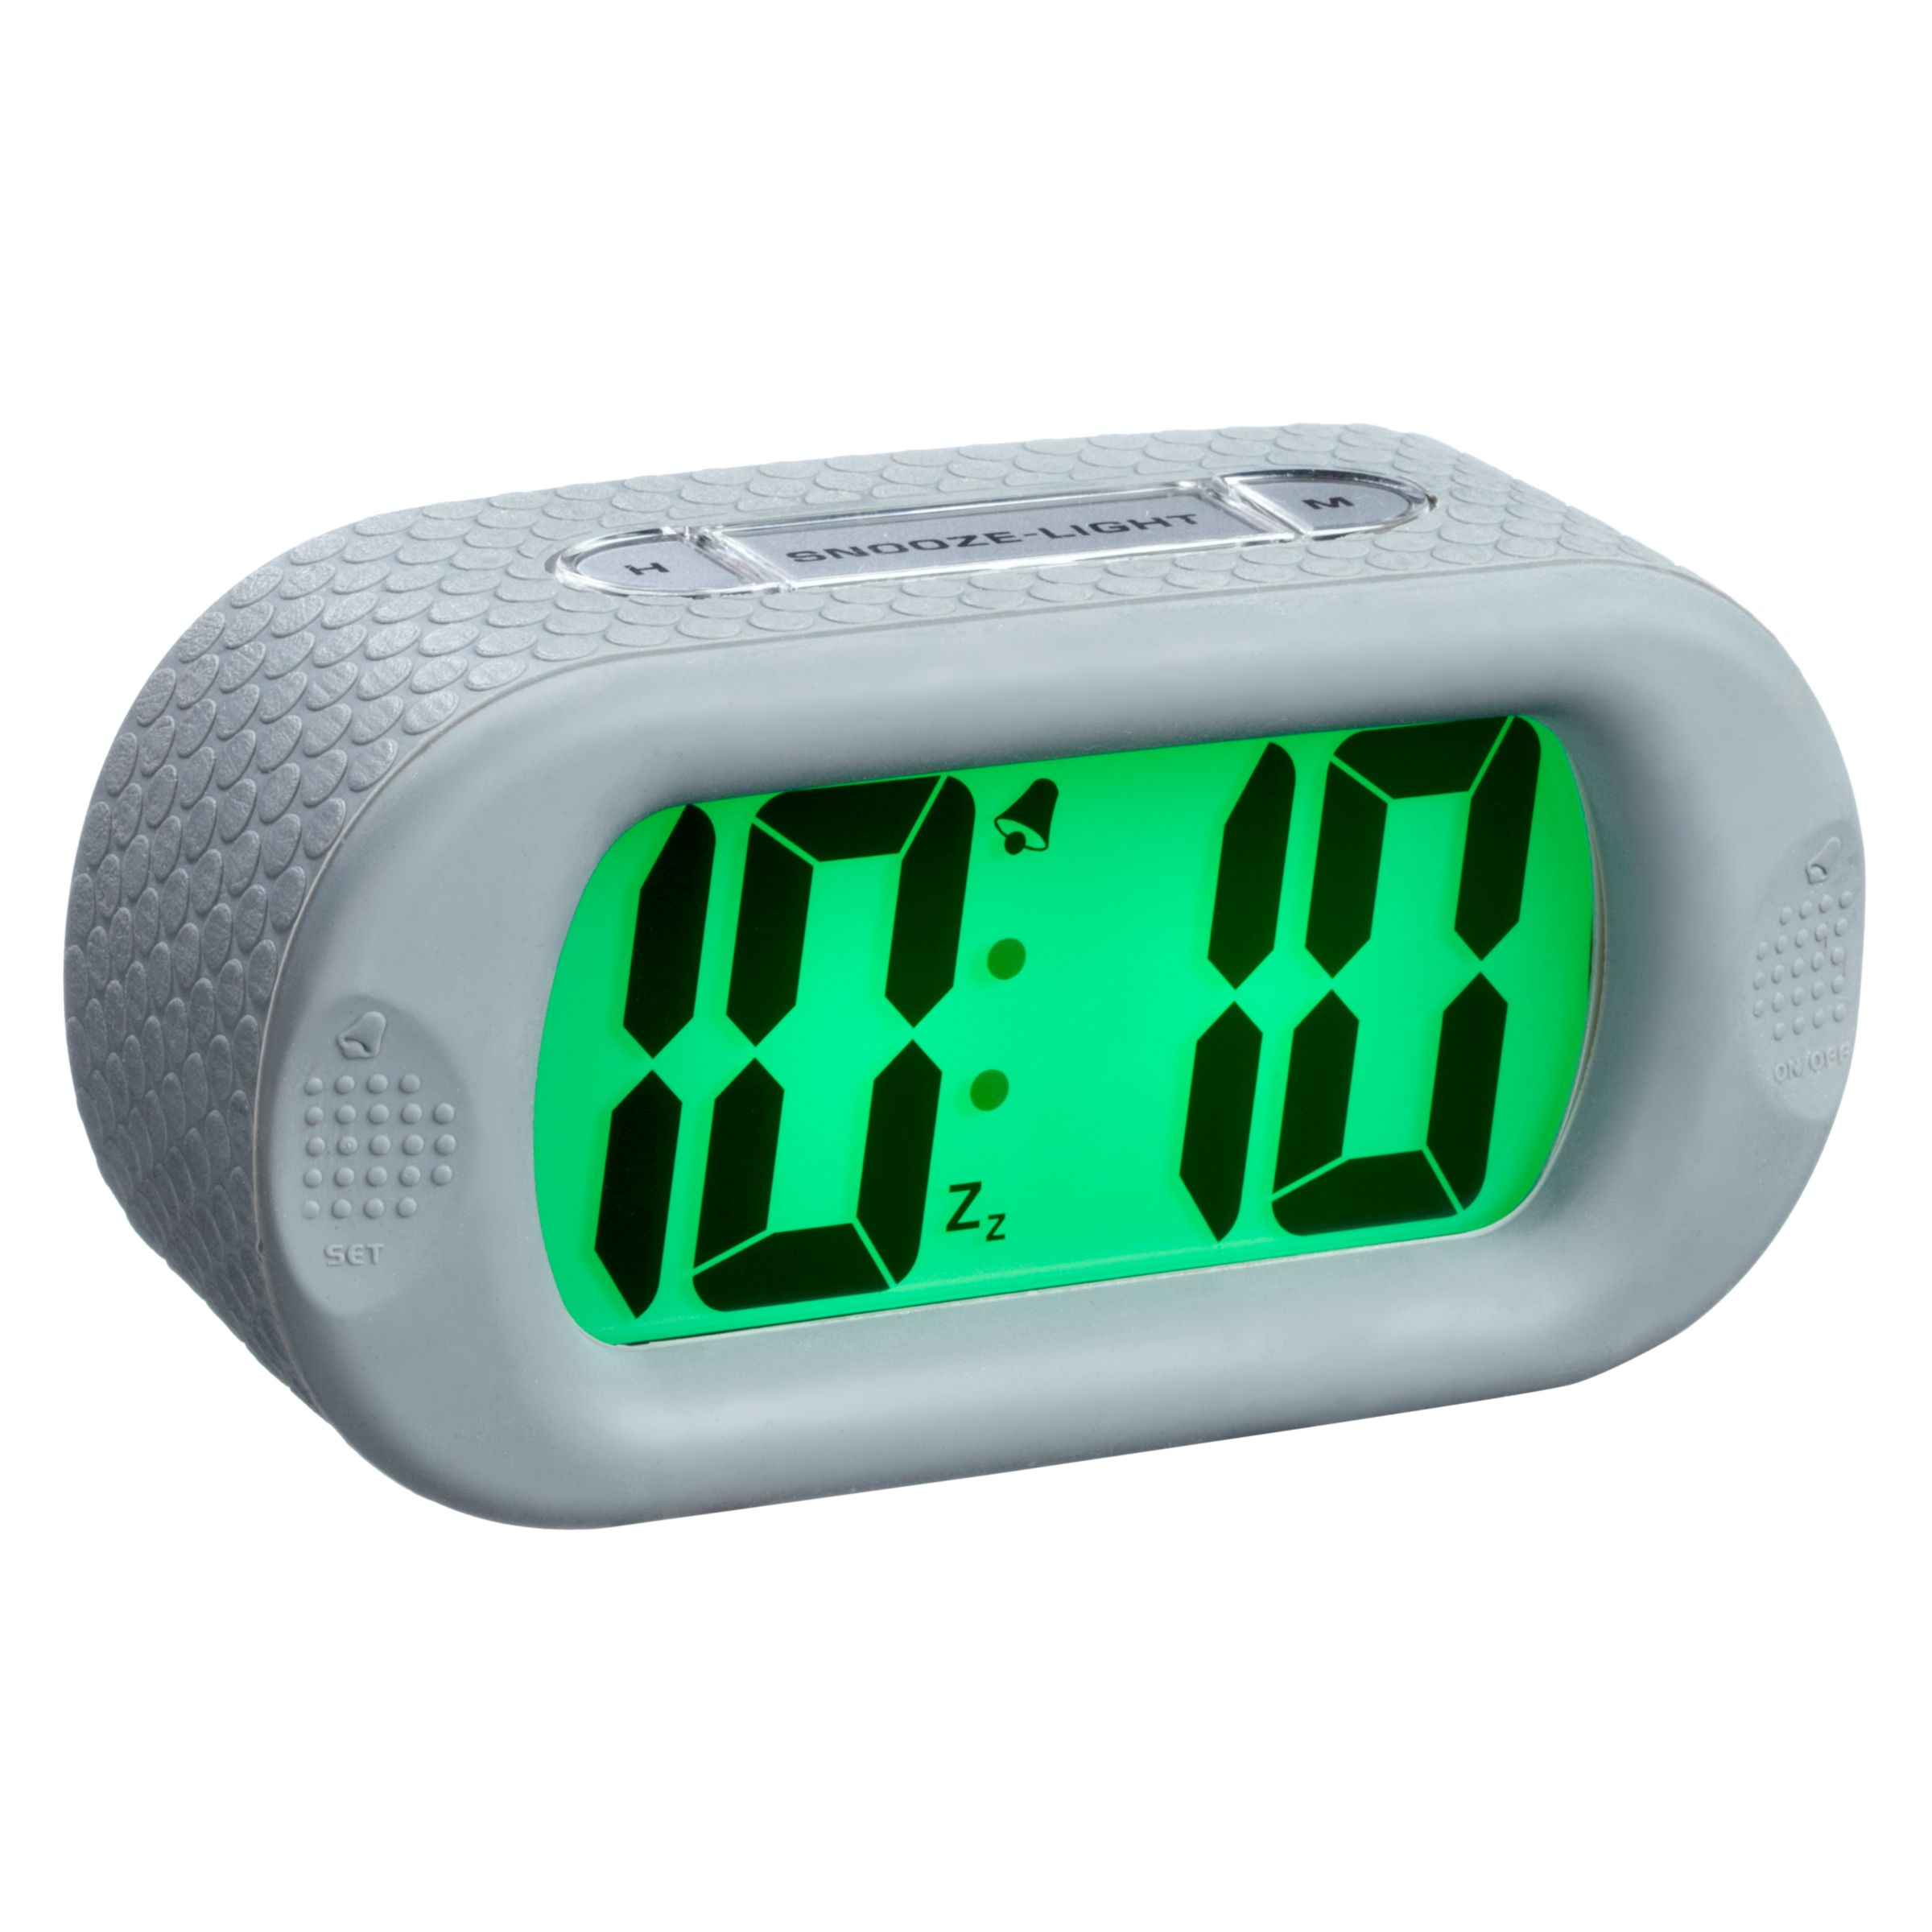 Acctim Acctim Silicone Jumbo LCD Alarm Clock